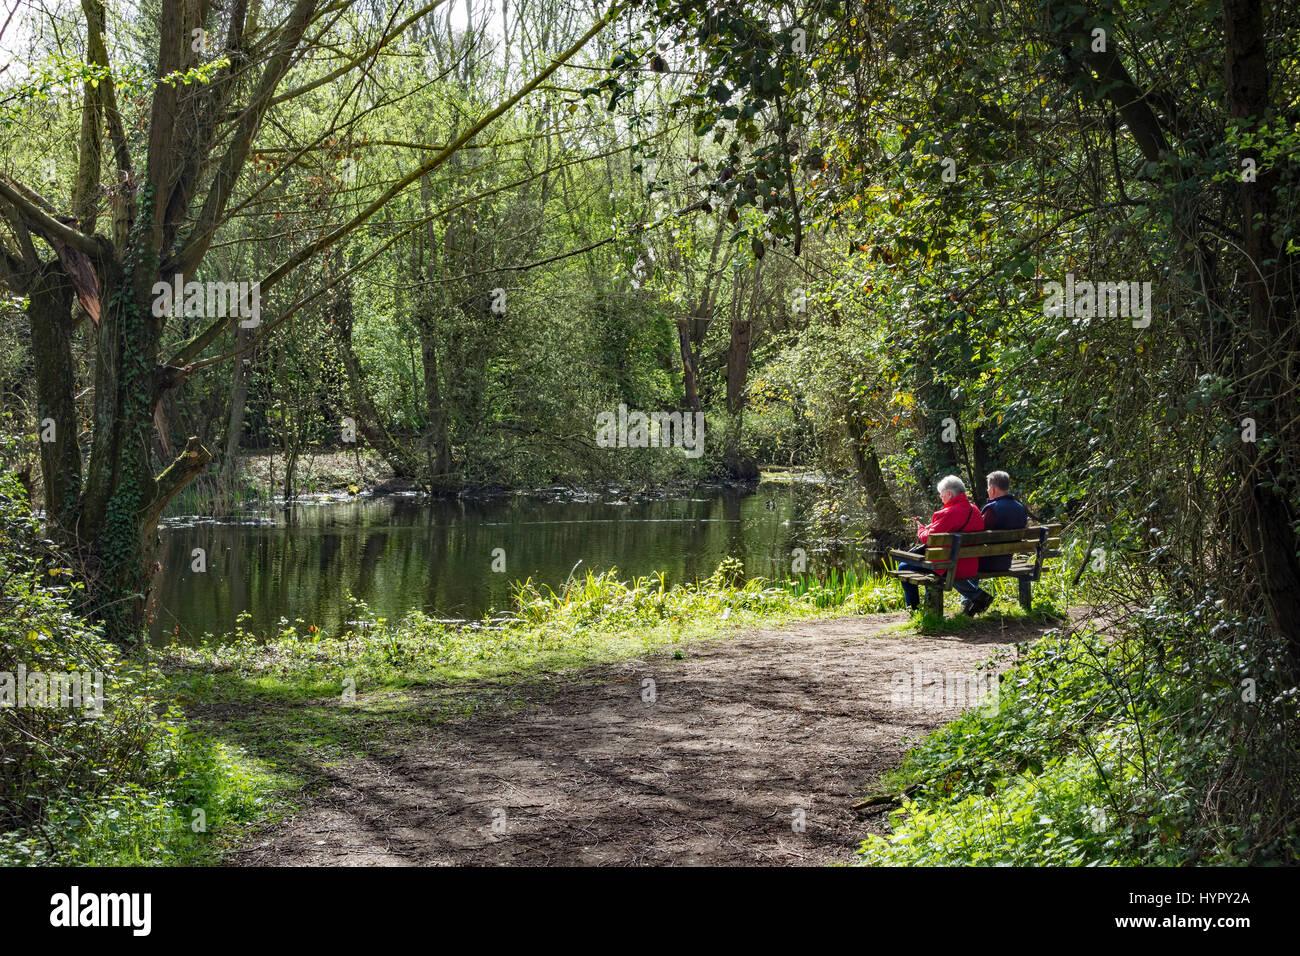 older-couple-sitting-on-bench-beside-lak